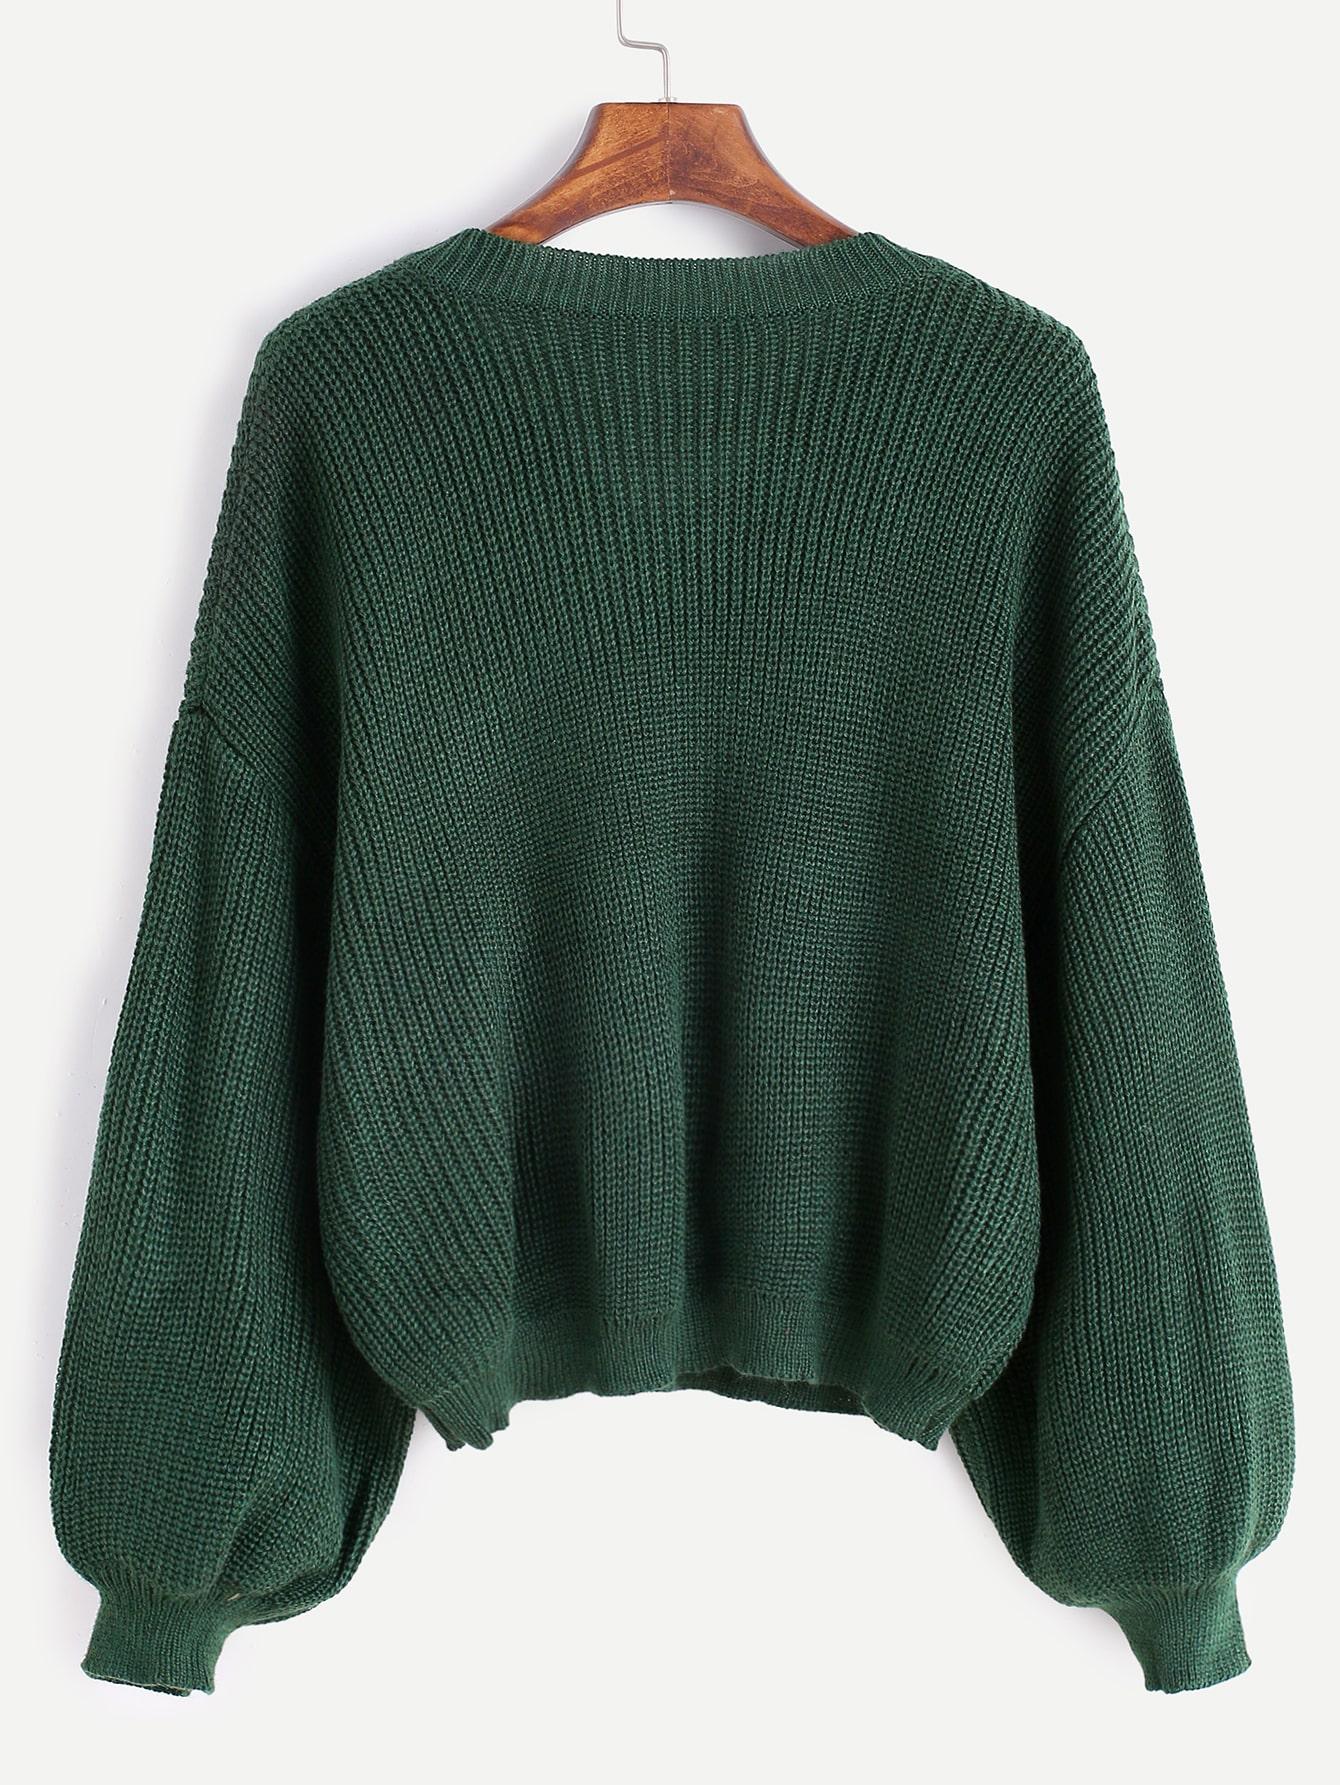 sweater161028031_2